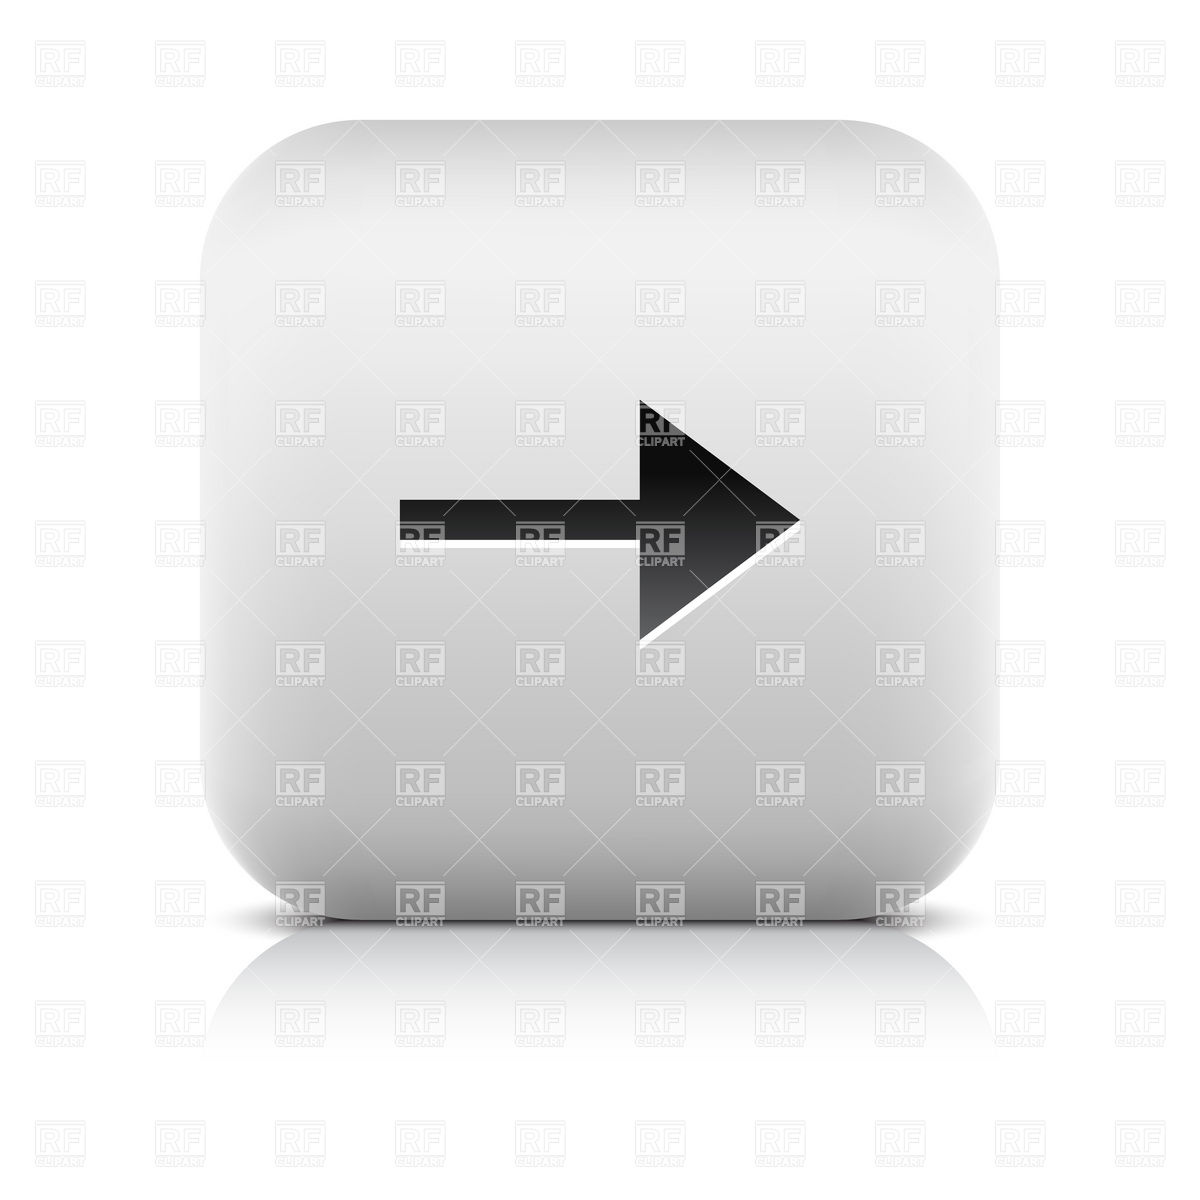 1200x1200 White Web Button With Arrowhead Vector Image Vector Artwork Of